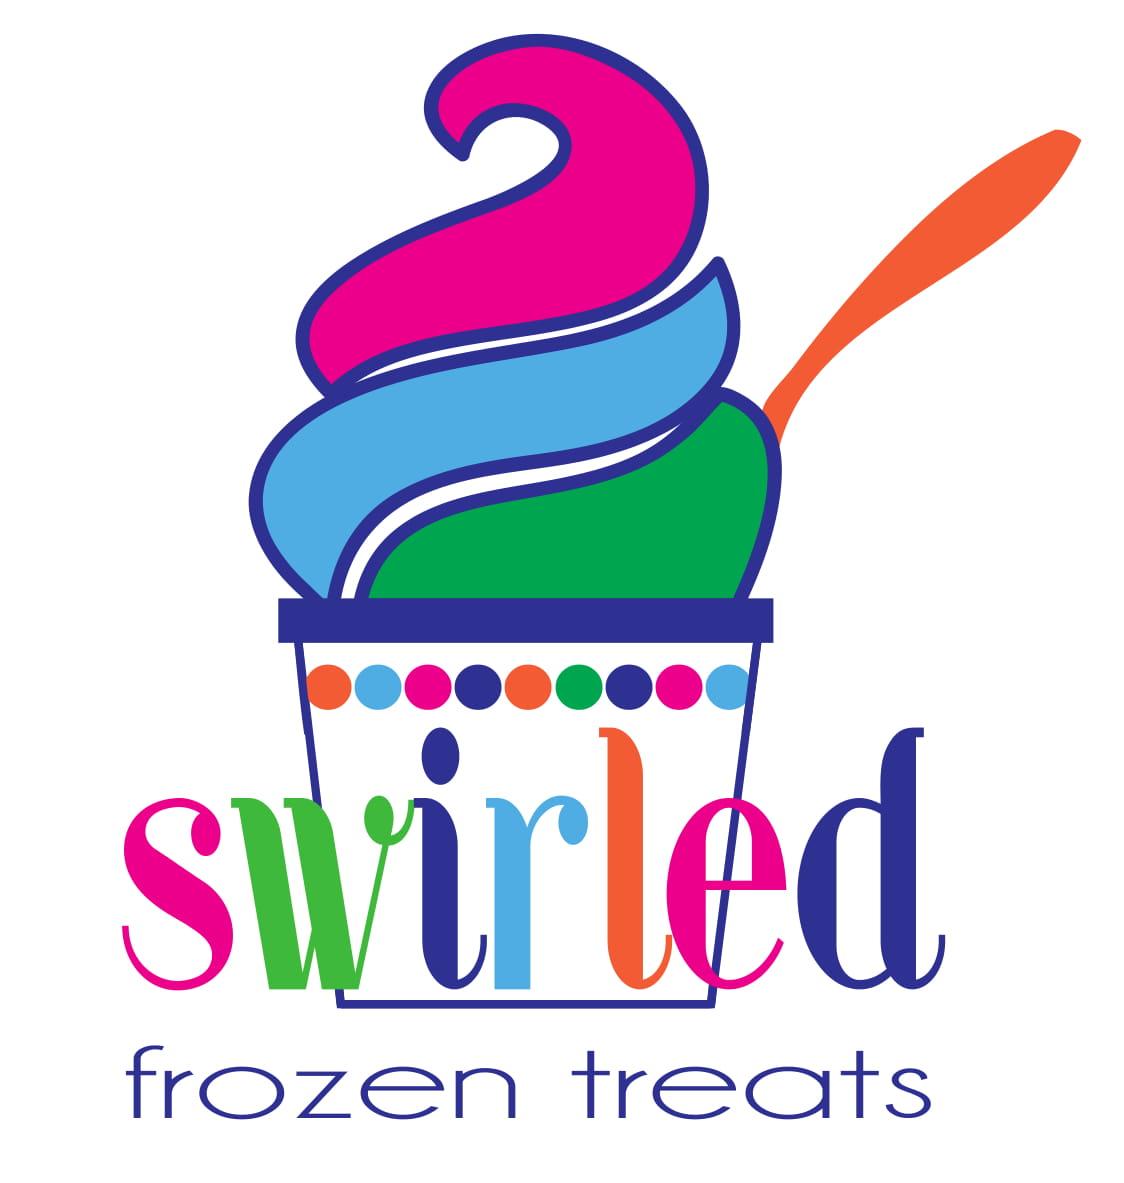 swirledfrozentreats.jpg